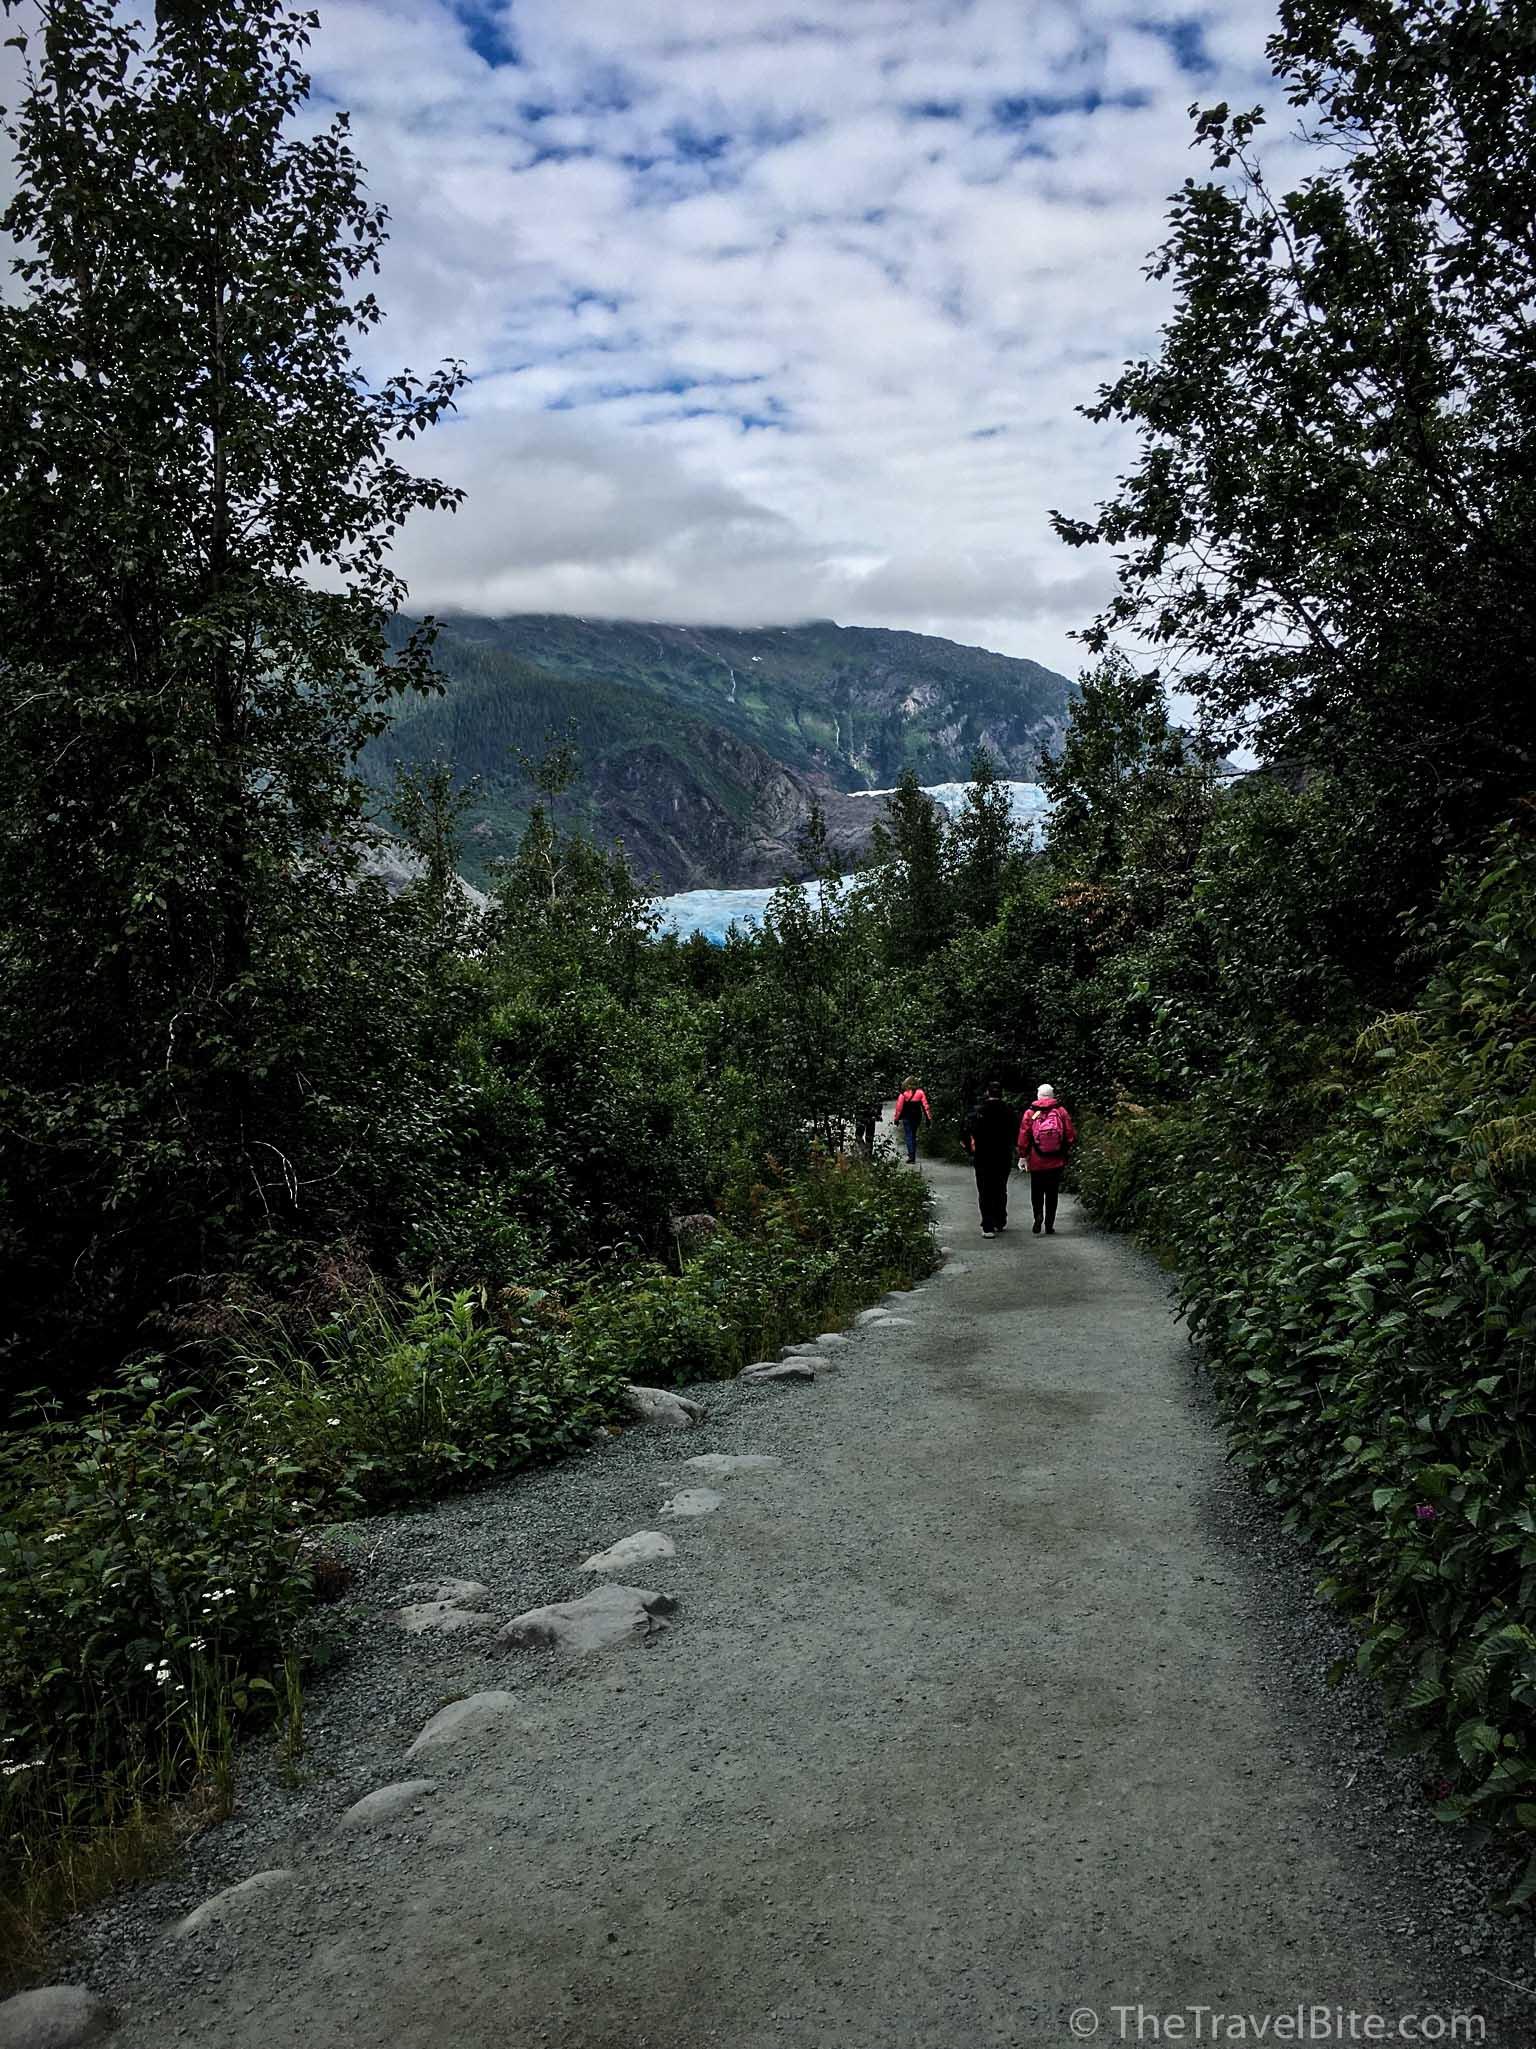 TheTravelBite_PeteWallace_JuneauAlaska-3.jpg